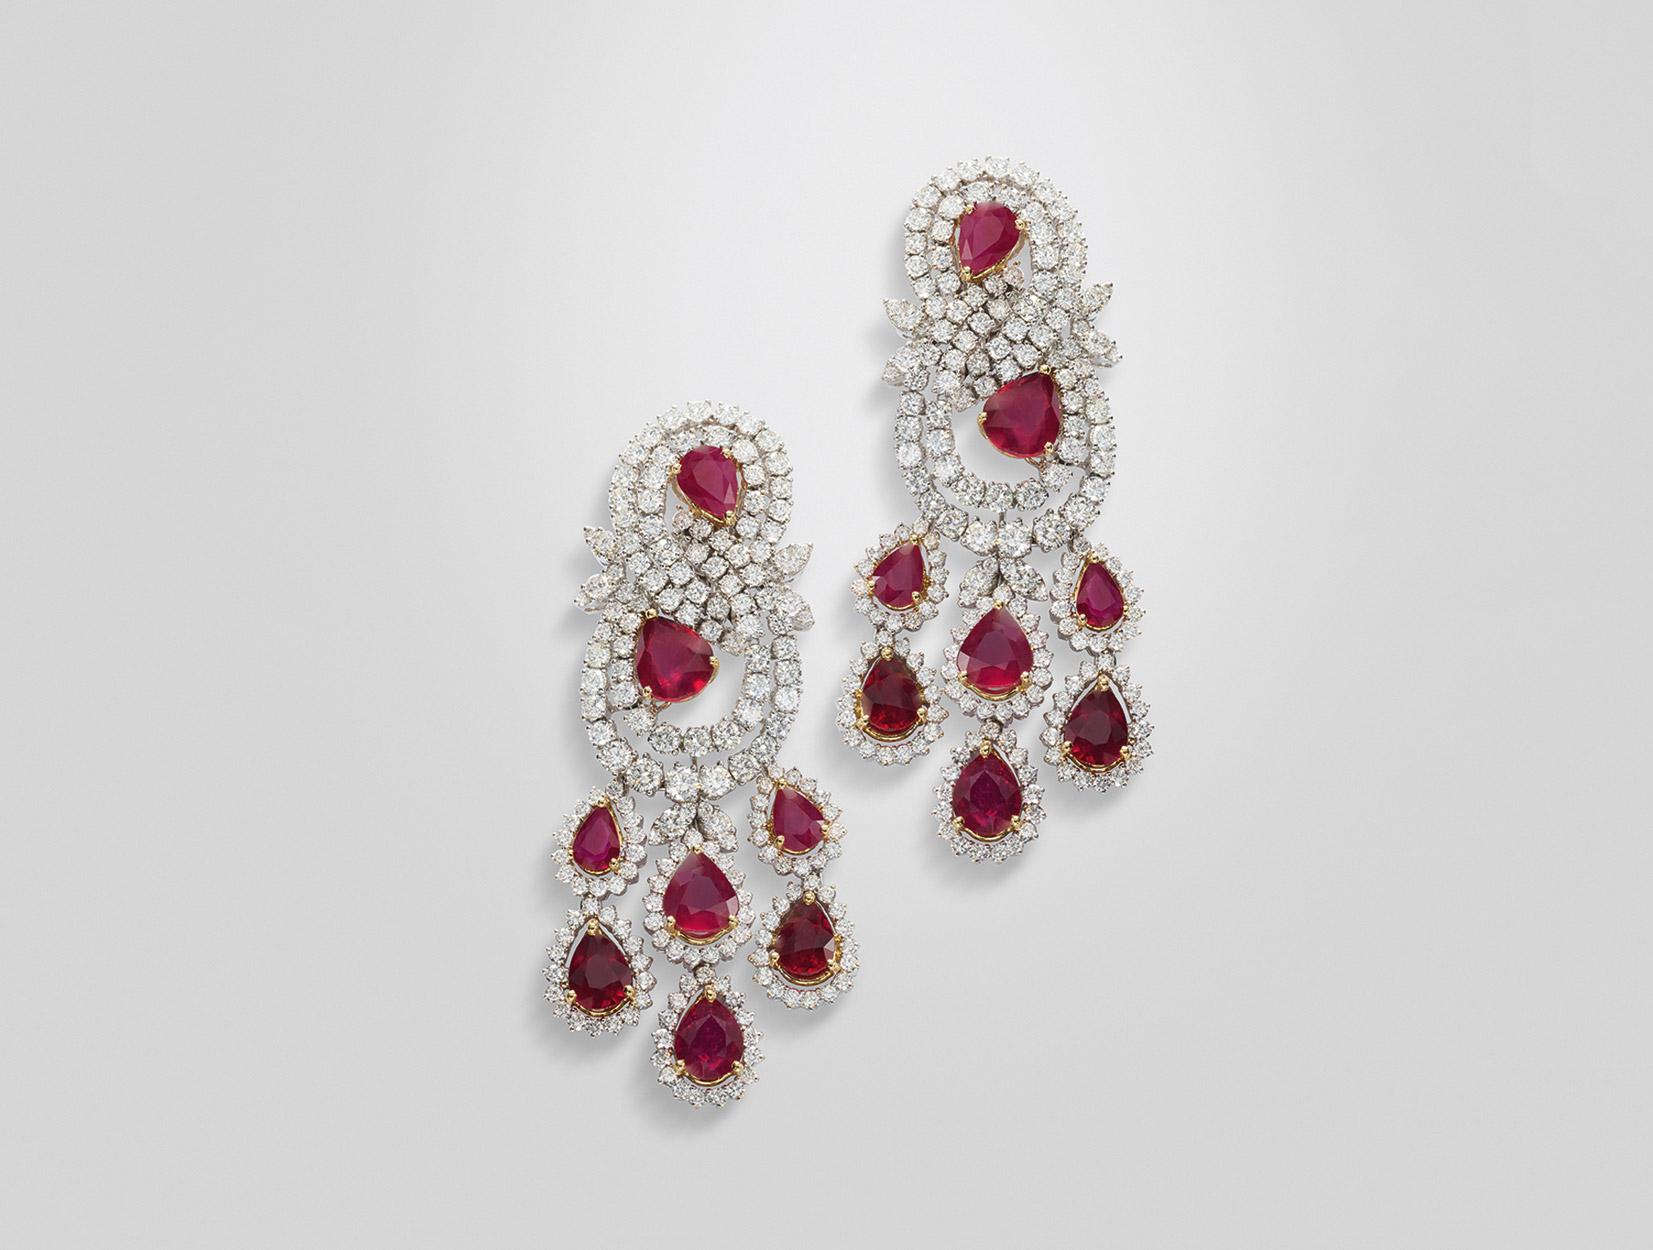 Rubies Earrings 01 | Maria Gaspari